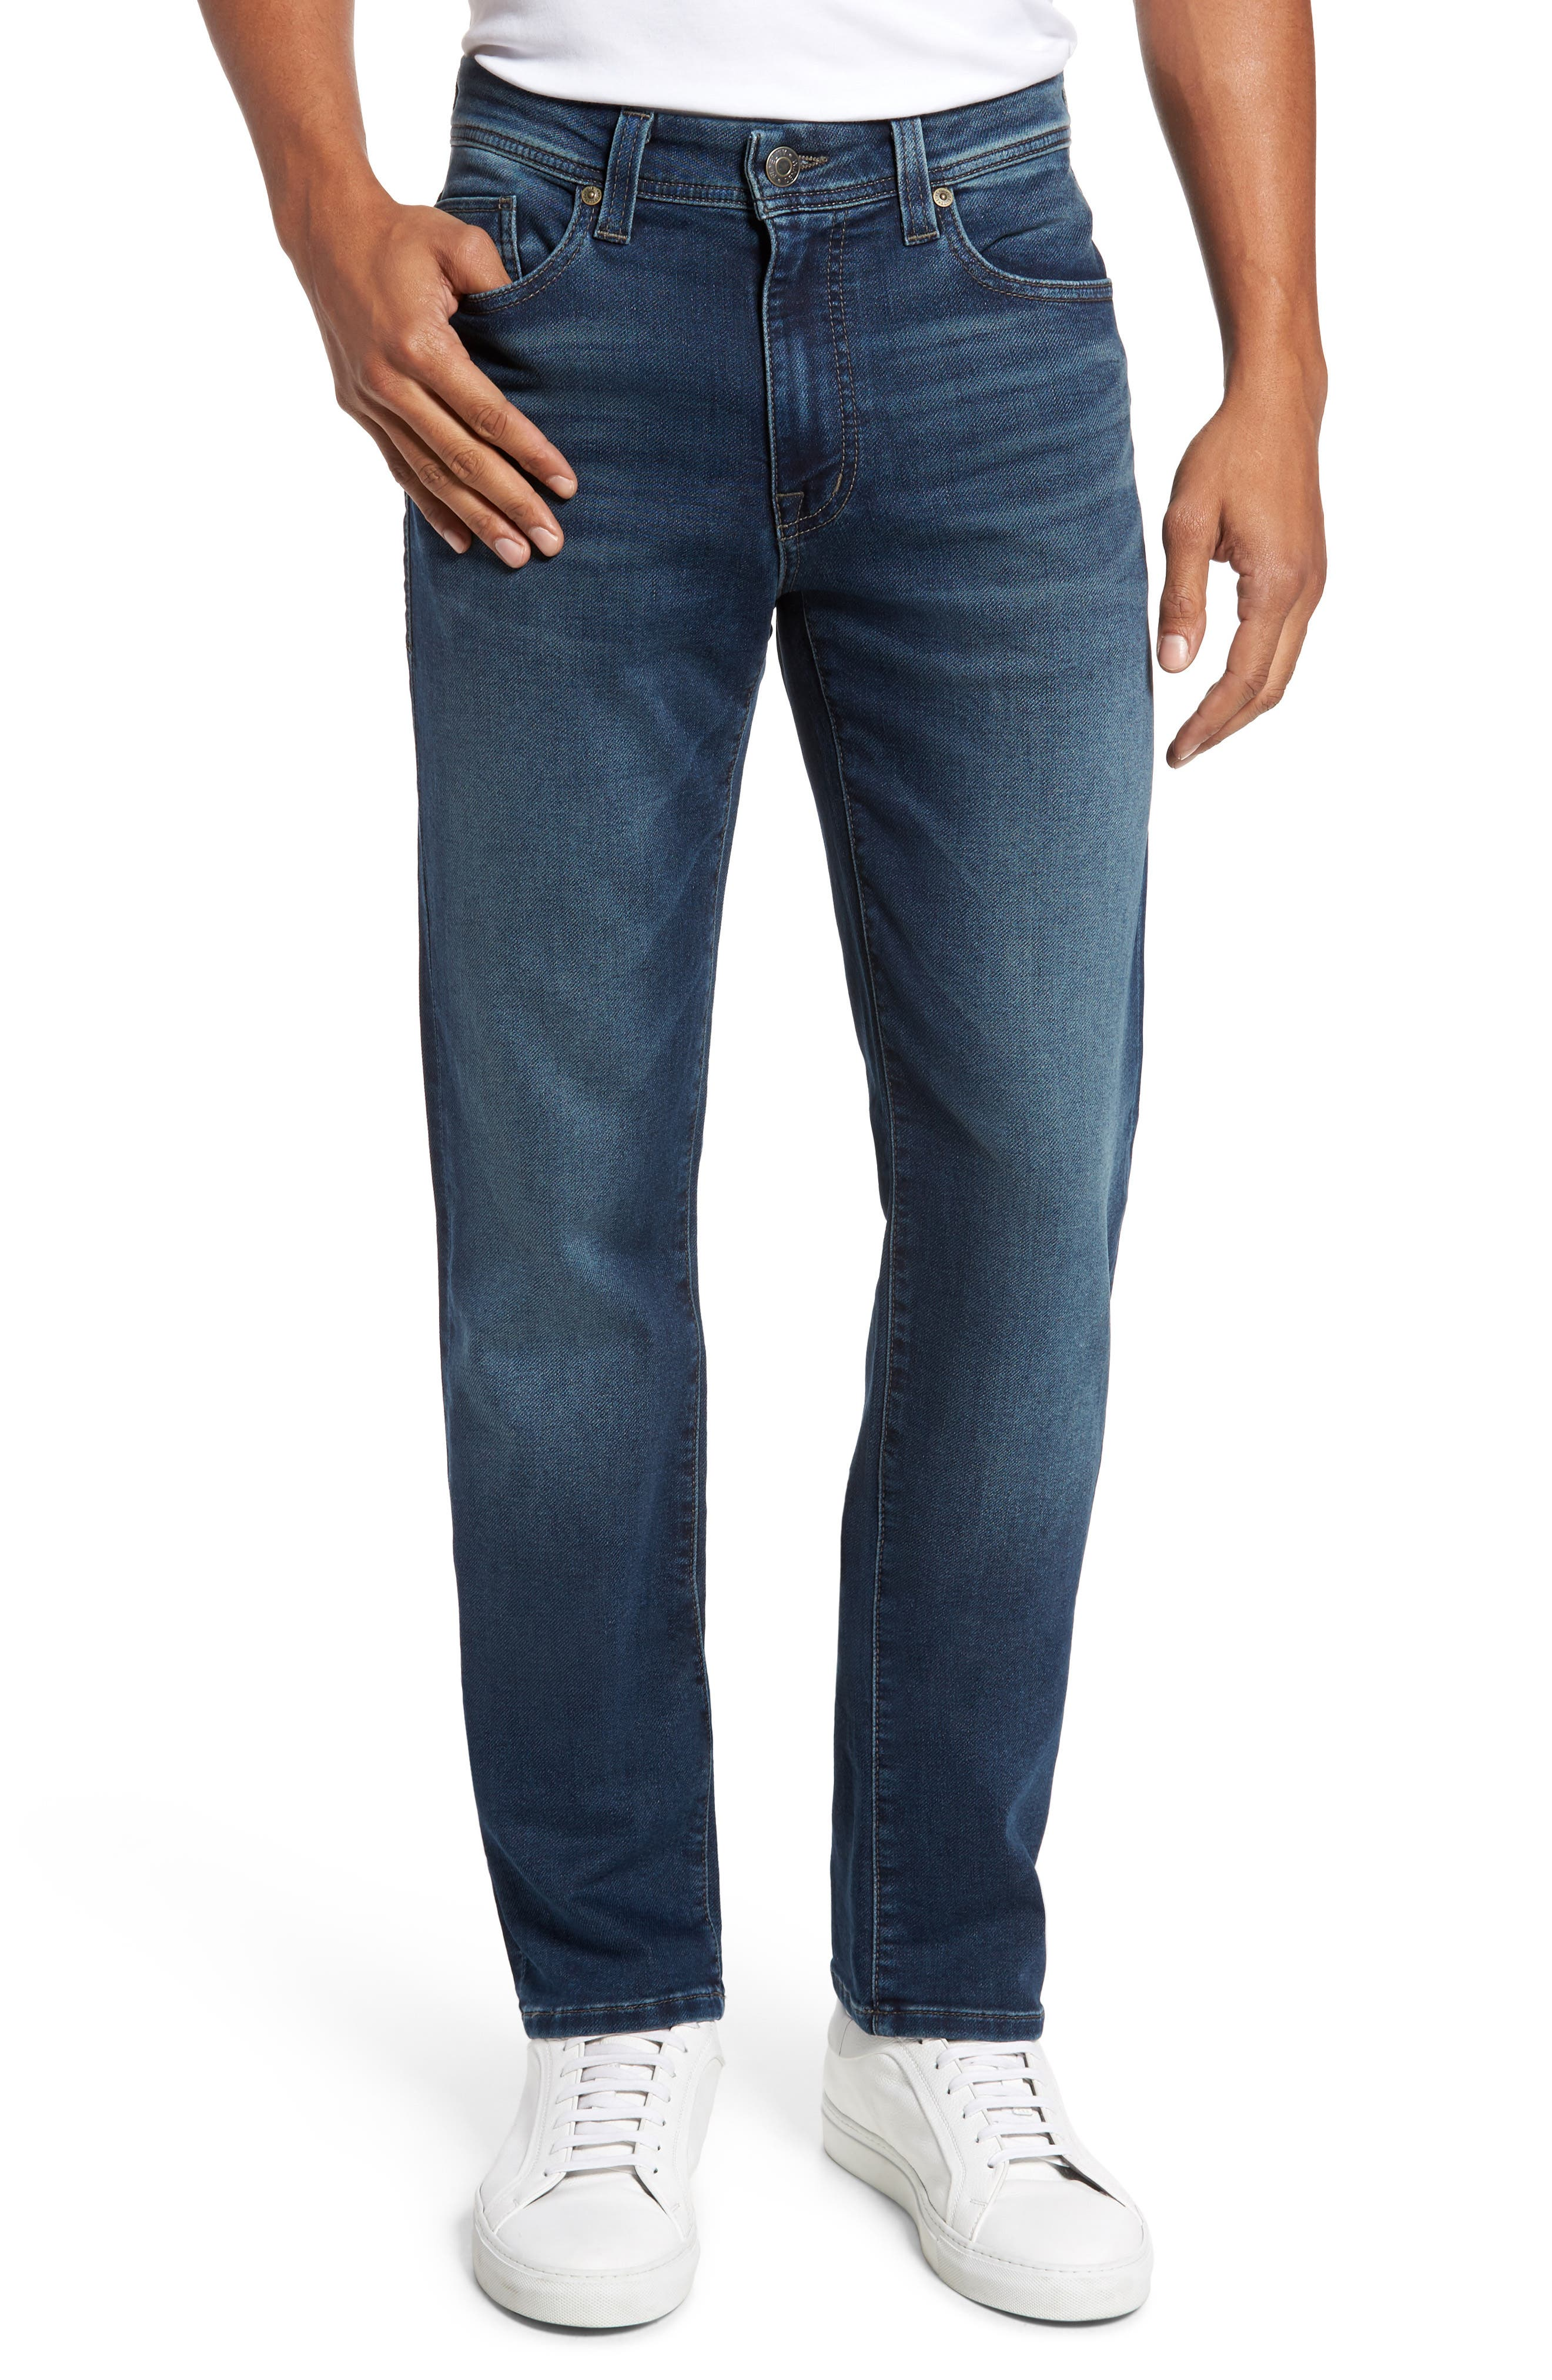 Jimmy Slim Straight Leg Jeans,                             Main thumbnail 1, color,                             400